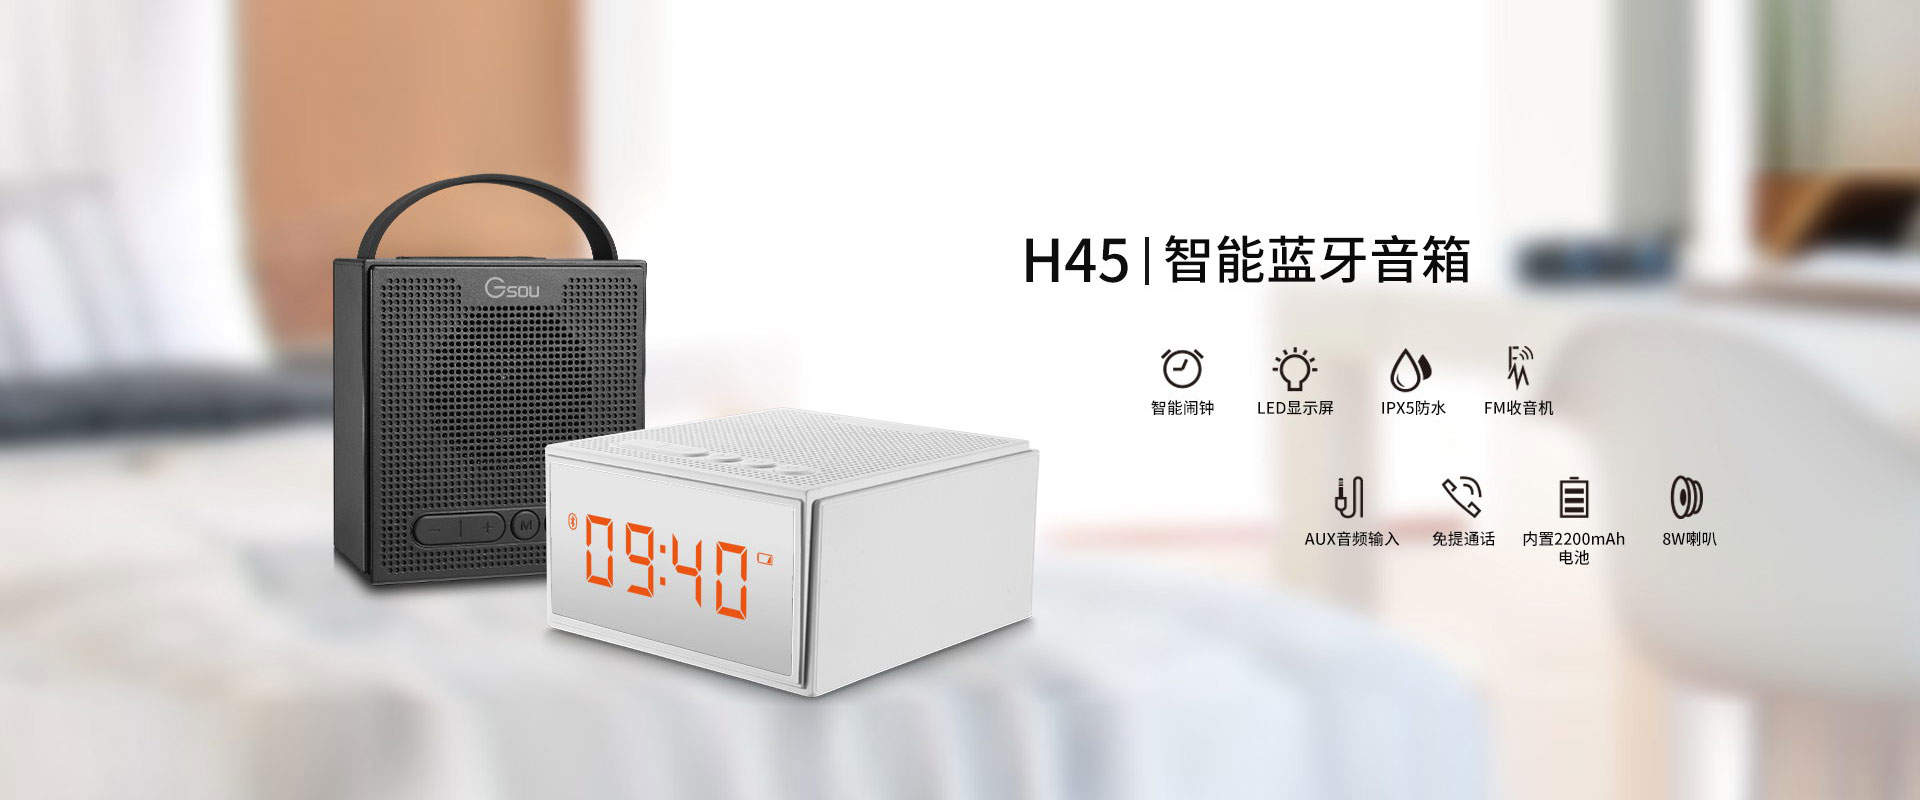 H45 智能蓝牙音箱